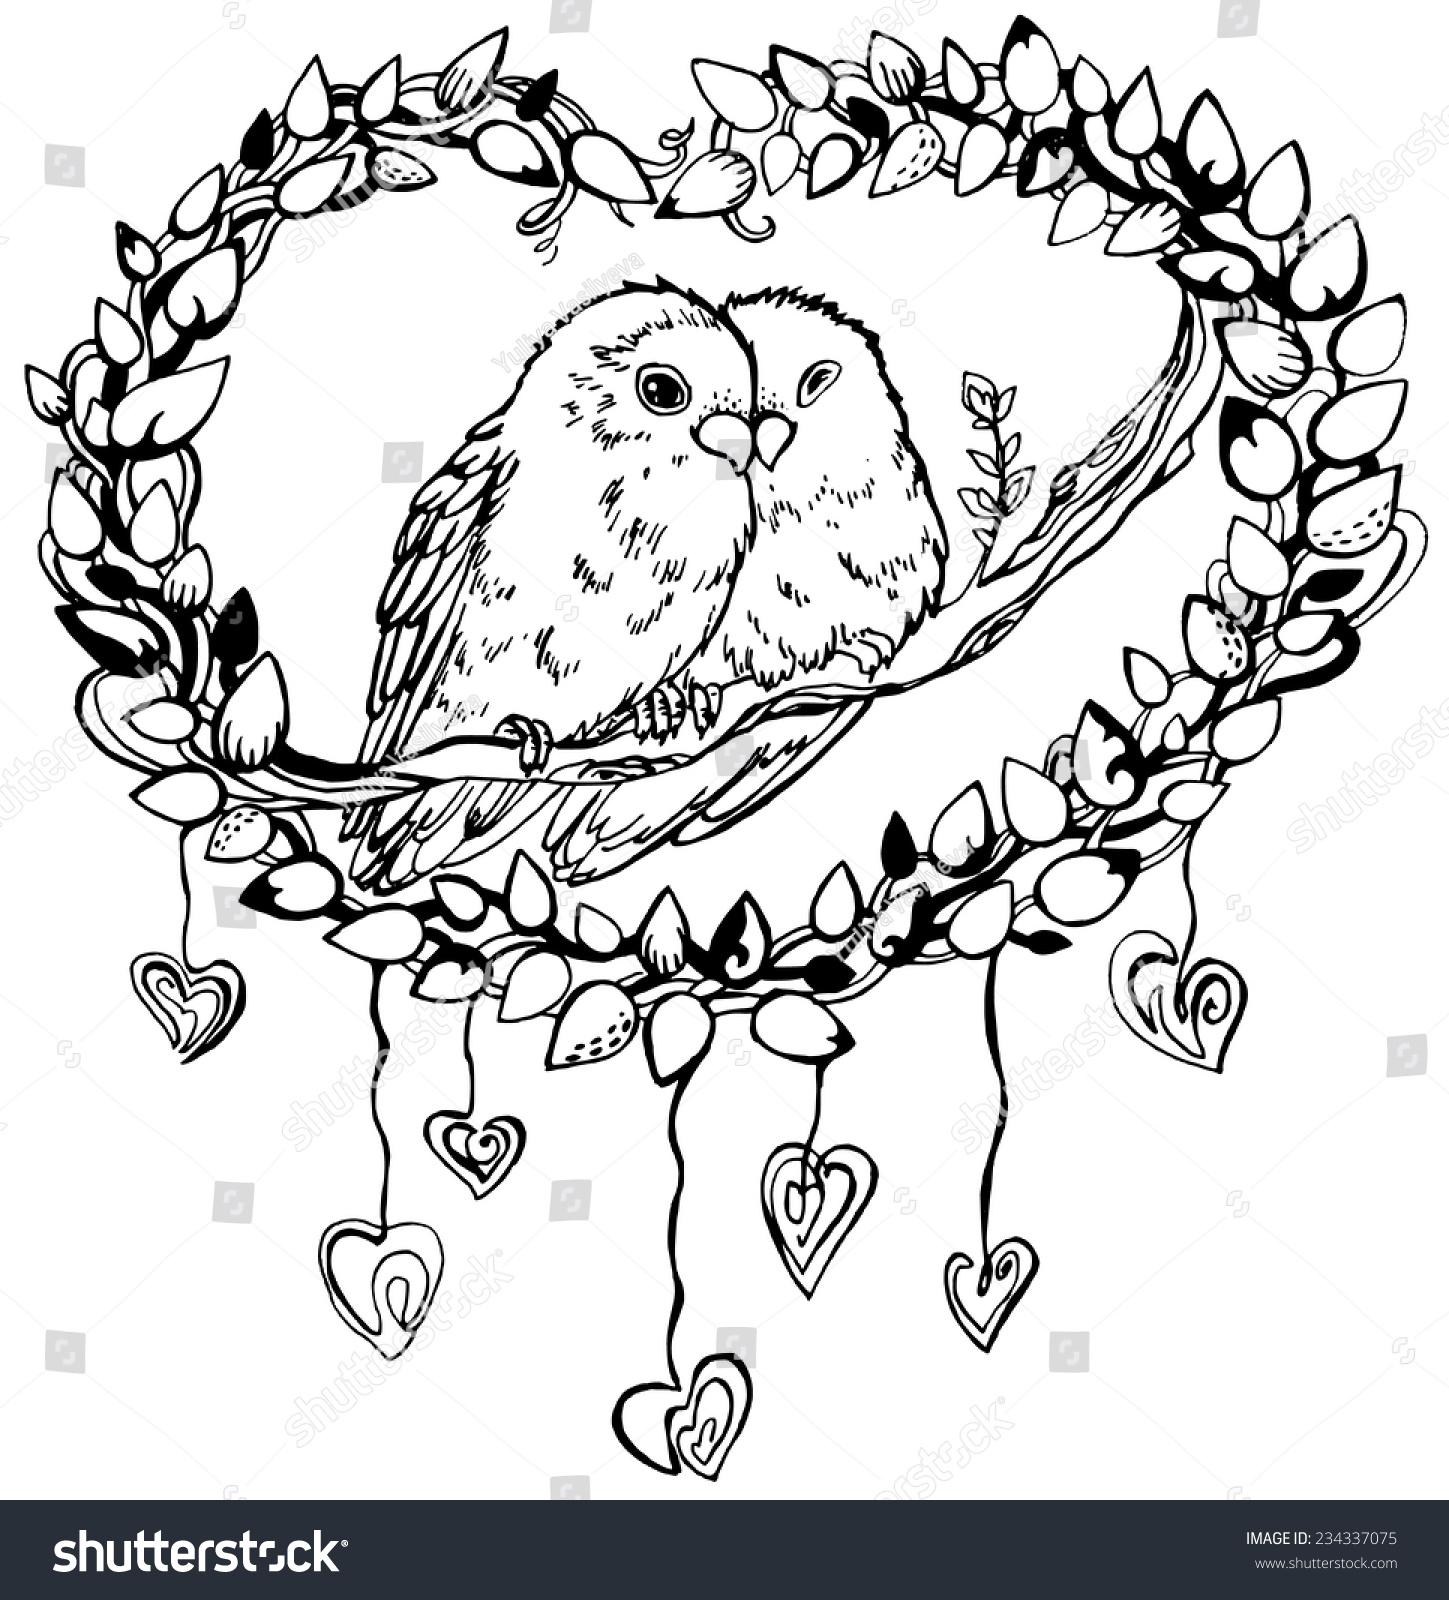 romantic image pair parrots lovebirds line stock vector 234337075